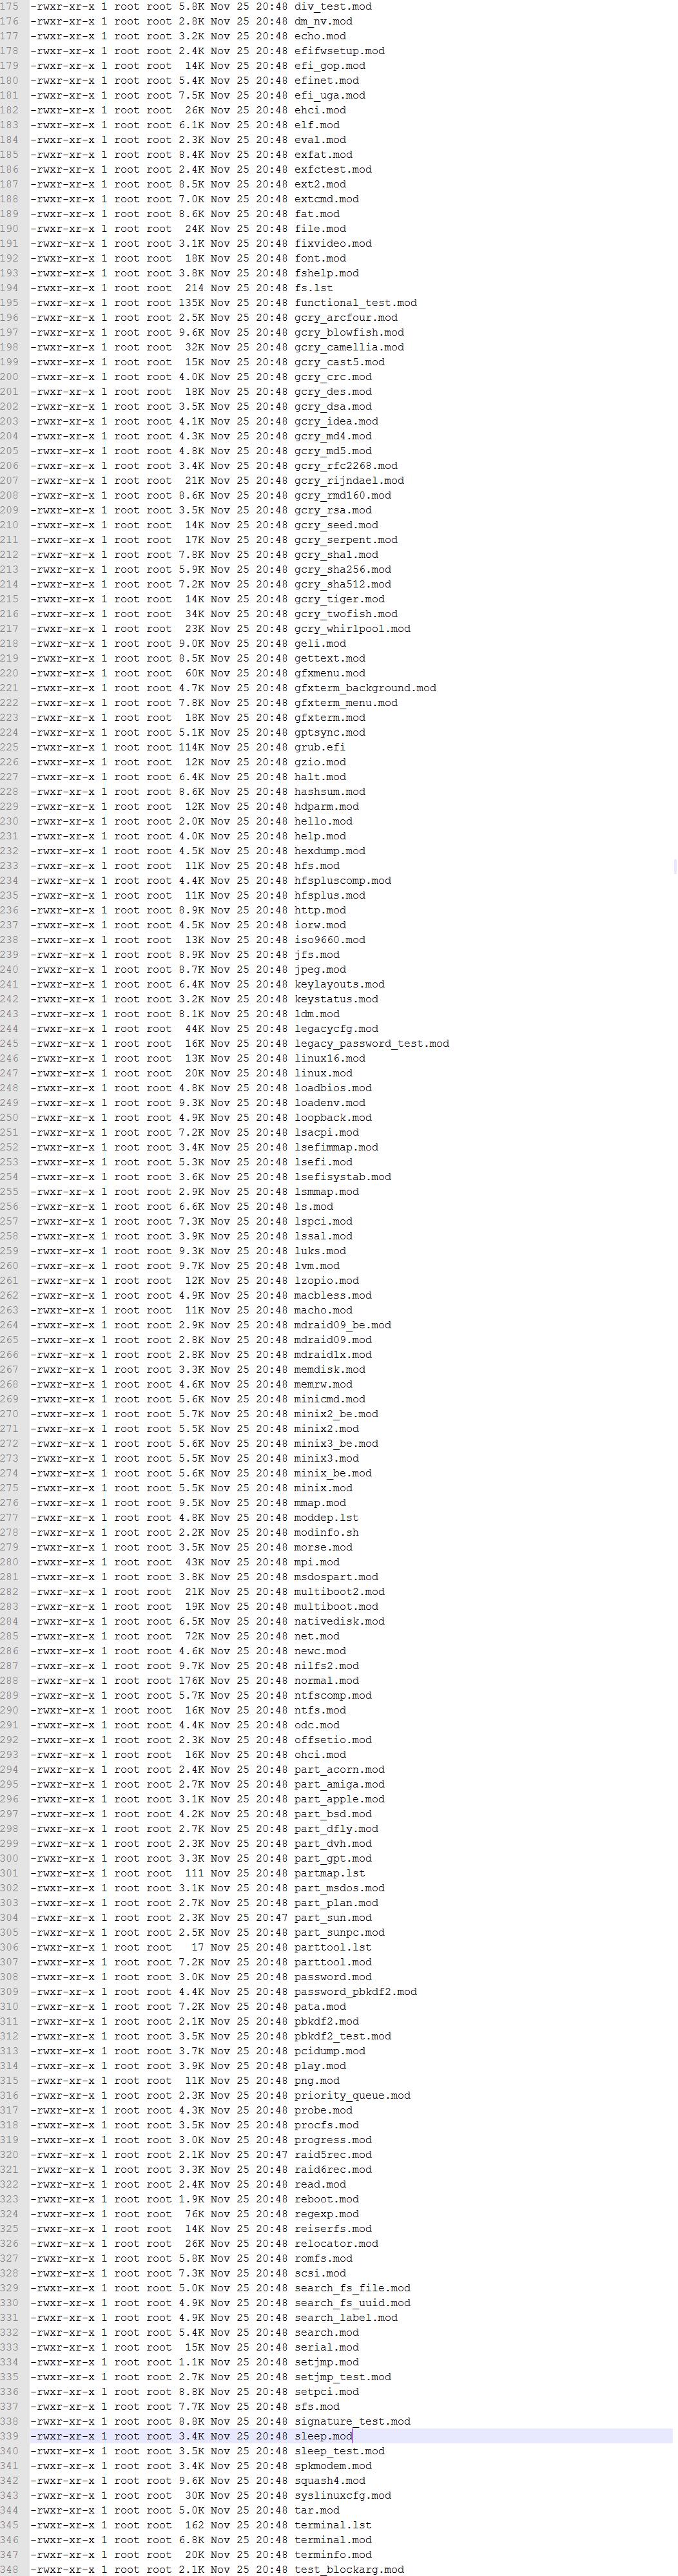 e489d7026427431c98bc11f11f816ced.png